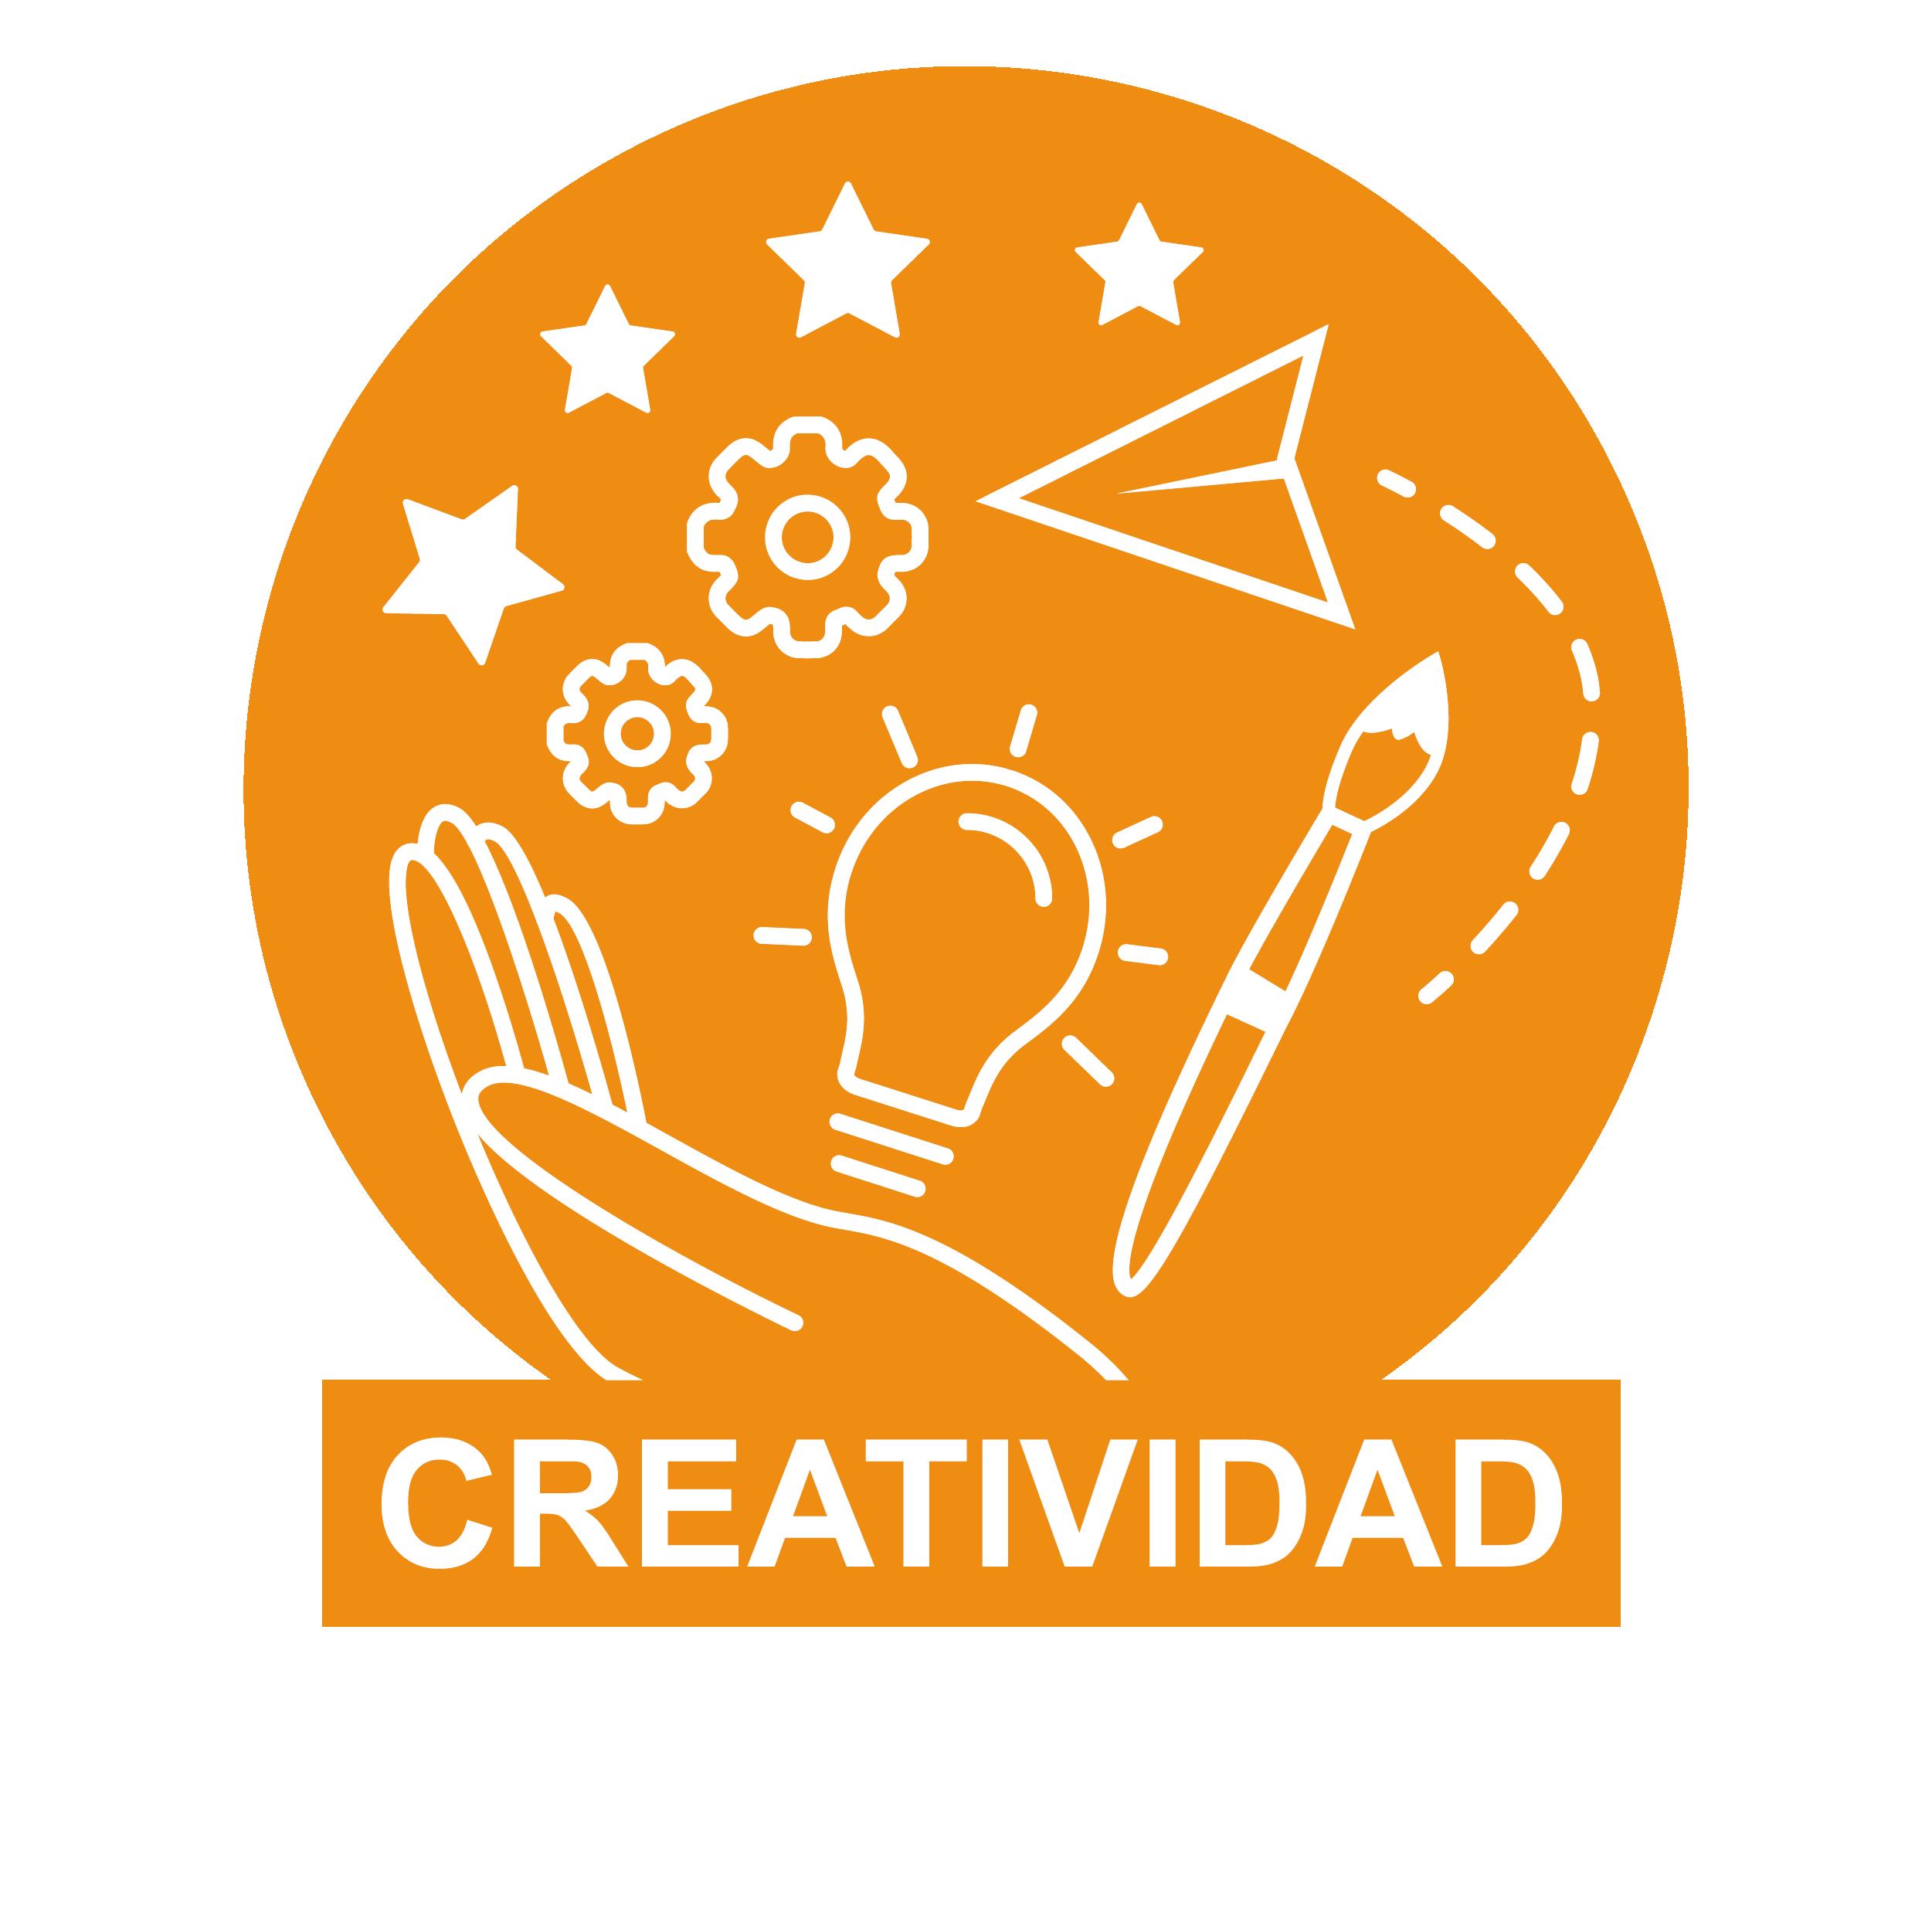 Inteligencia creativa despierta grupal